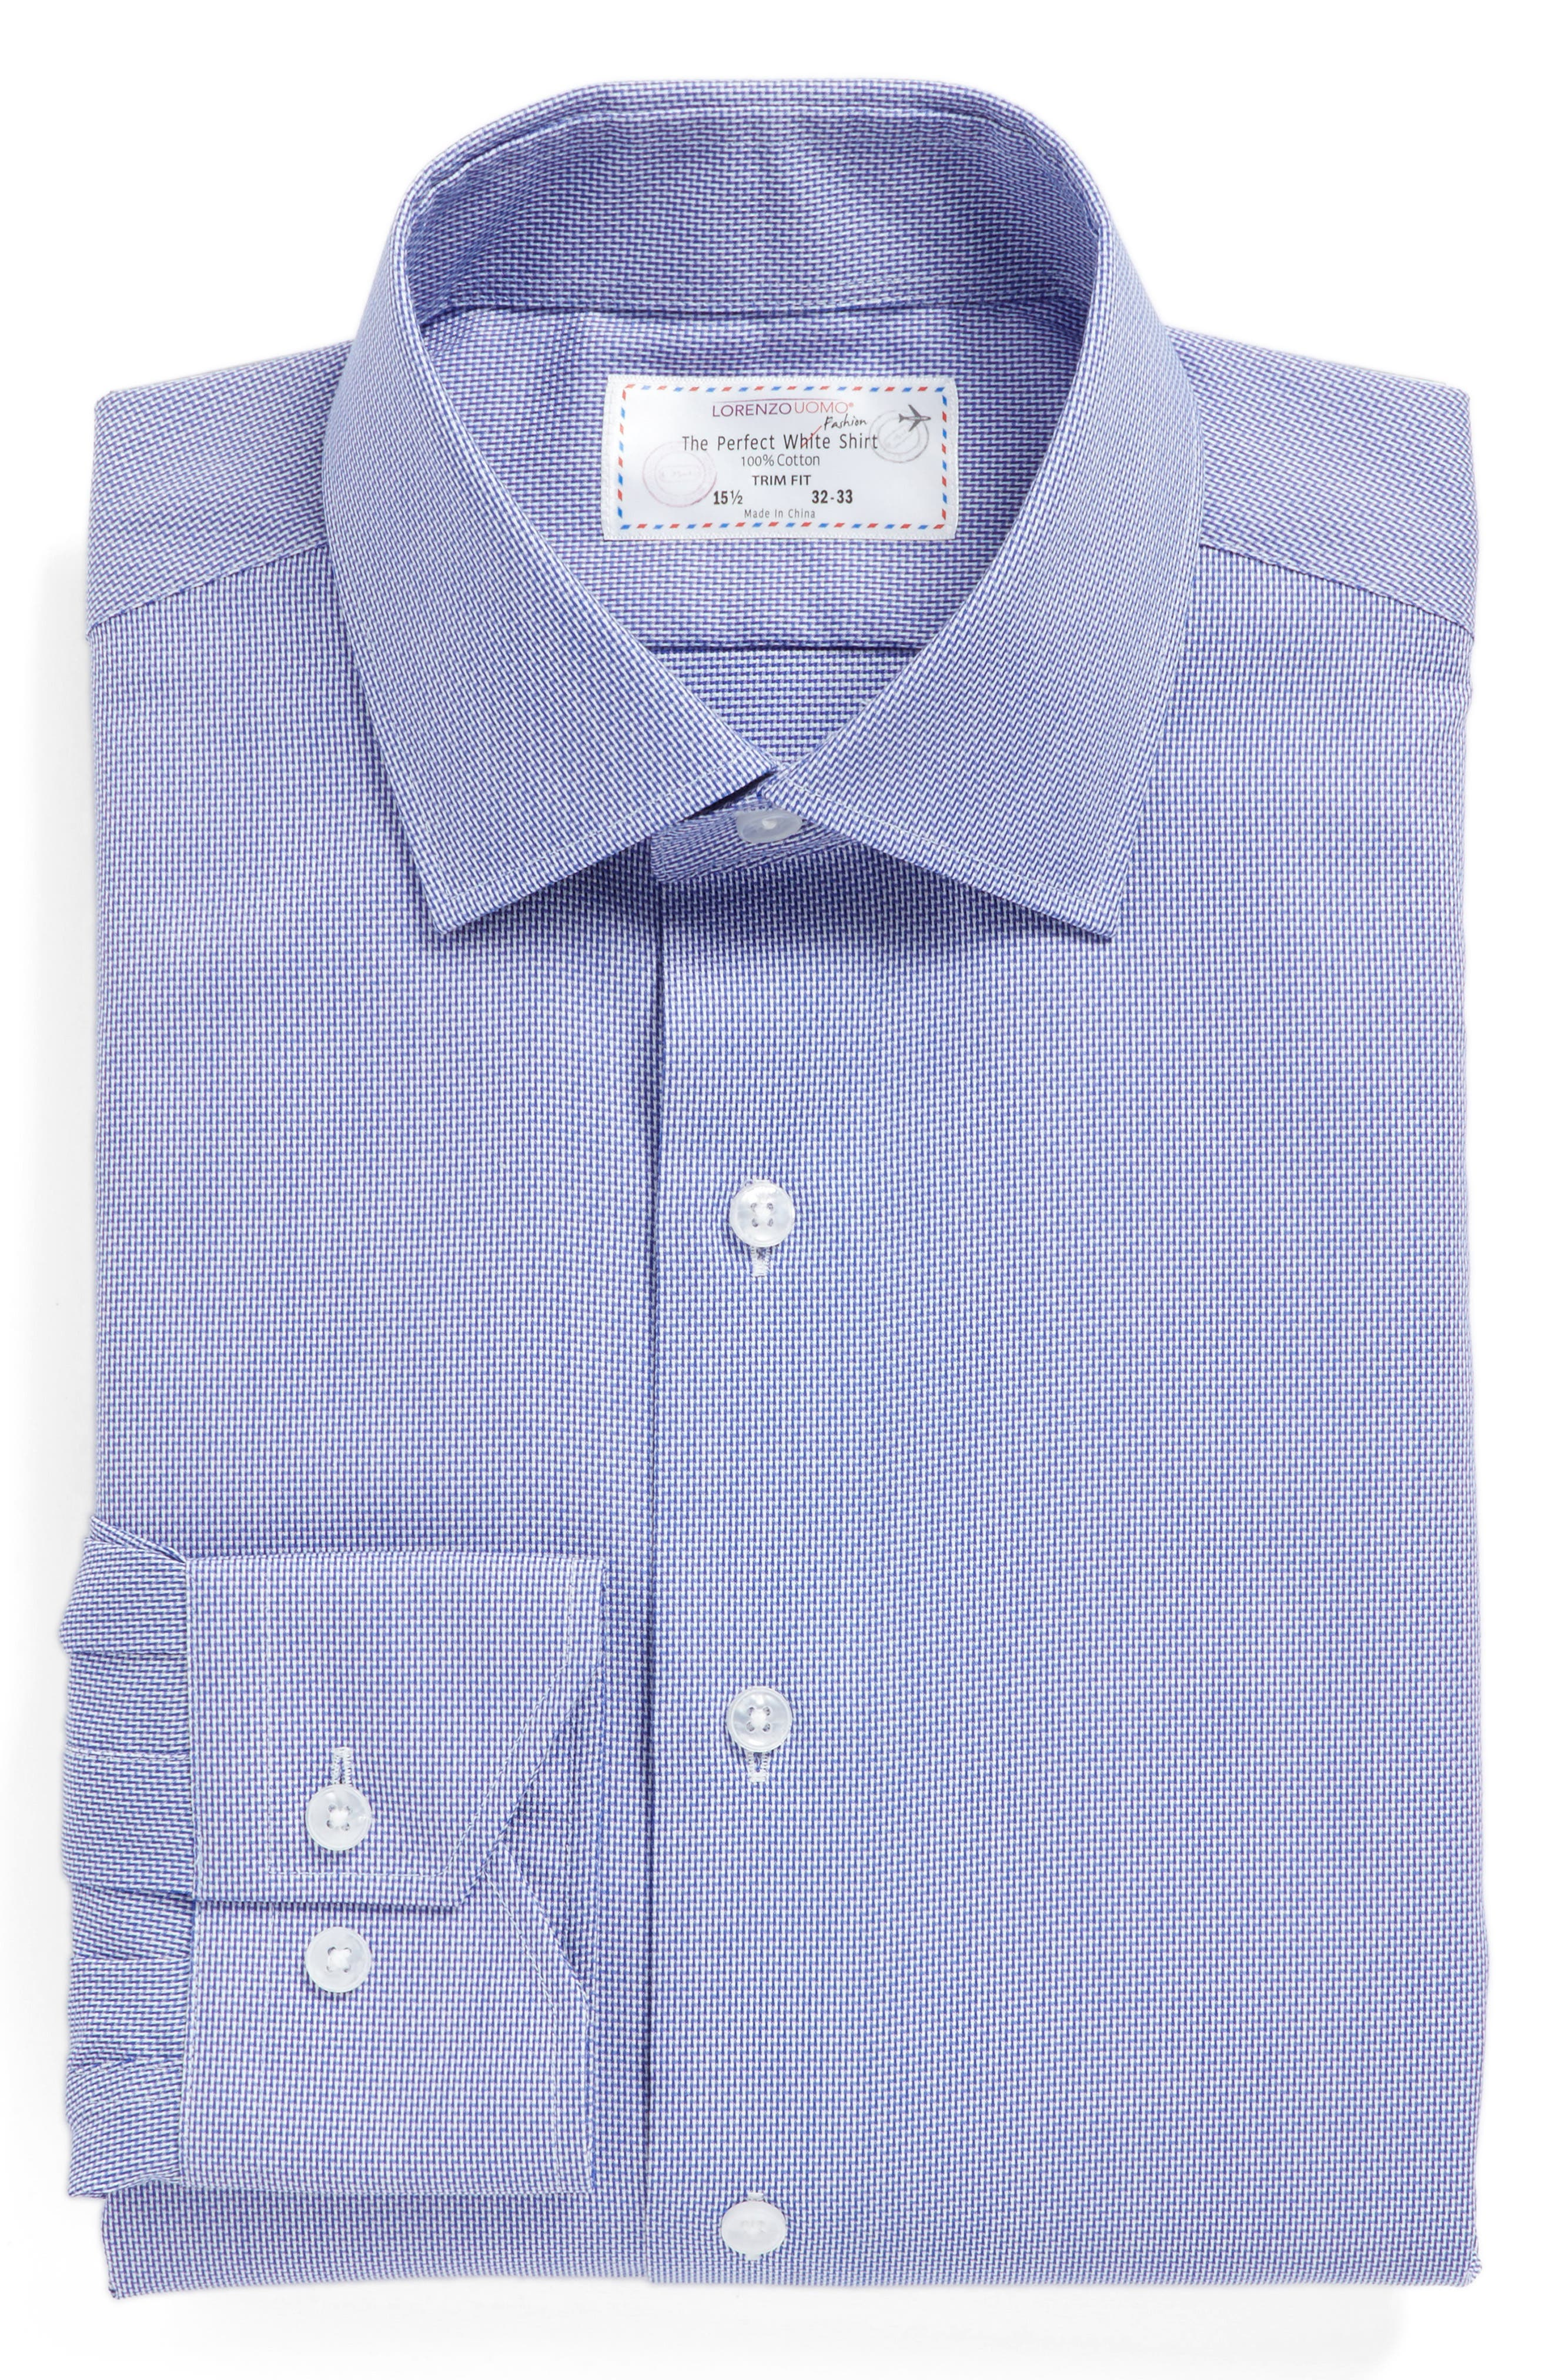 Trim Fit Solid Dress Shirt,                             Alternate thumbnail 4, color,                             Navy